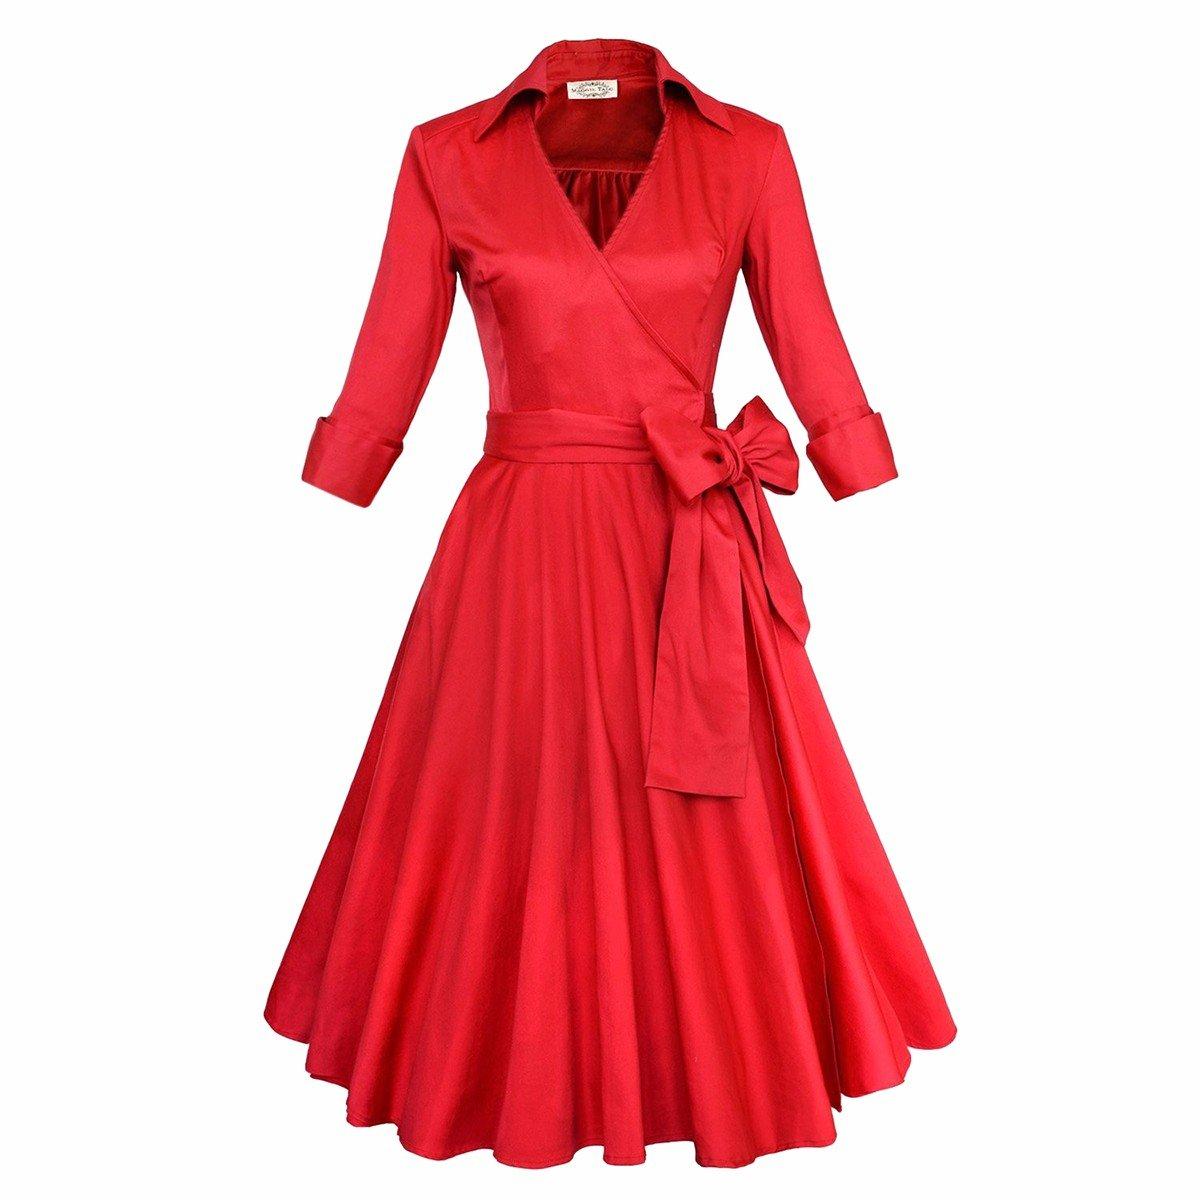 fba78df34c4a Top 10 wholesale Vintage 50s Polka Dot Dress - Chinabrands.com